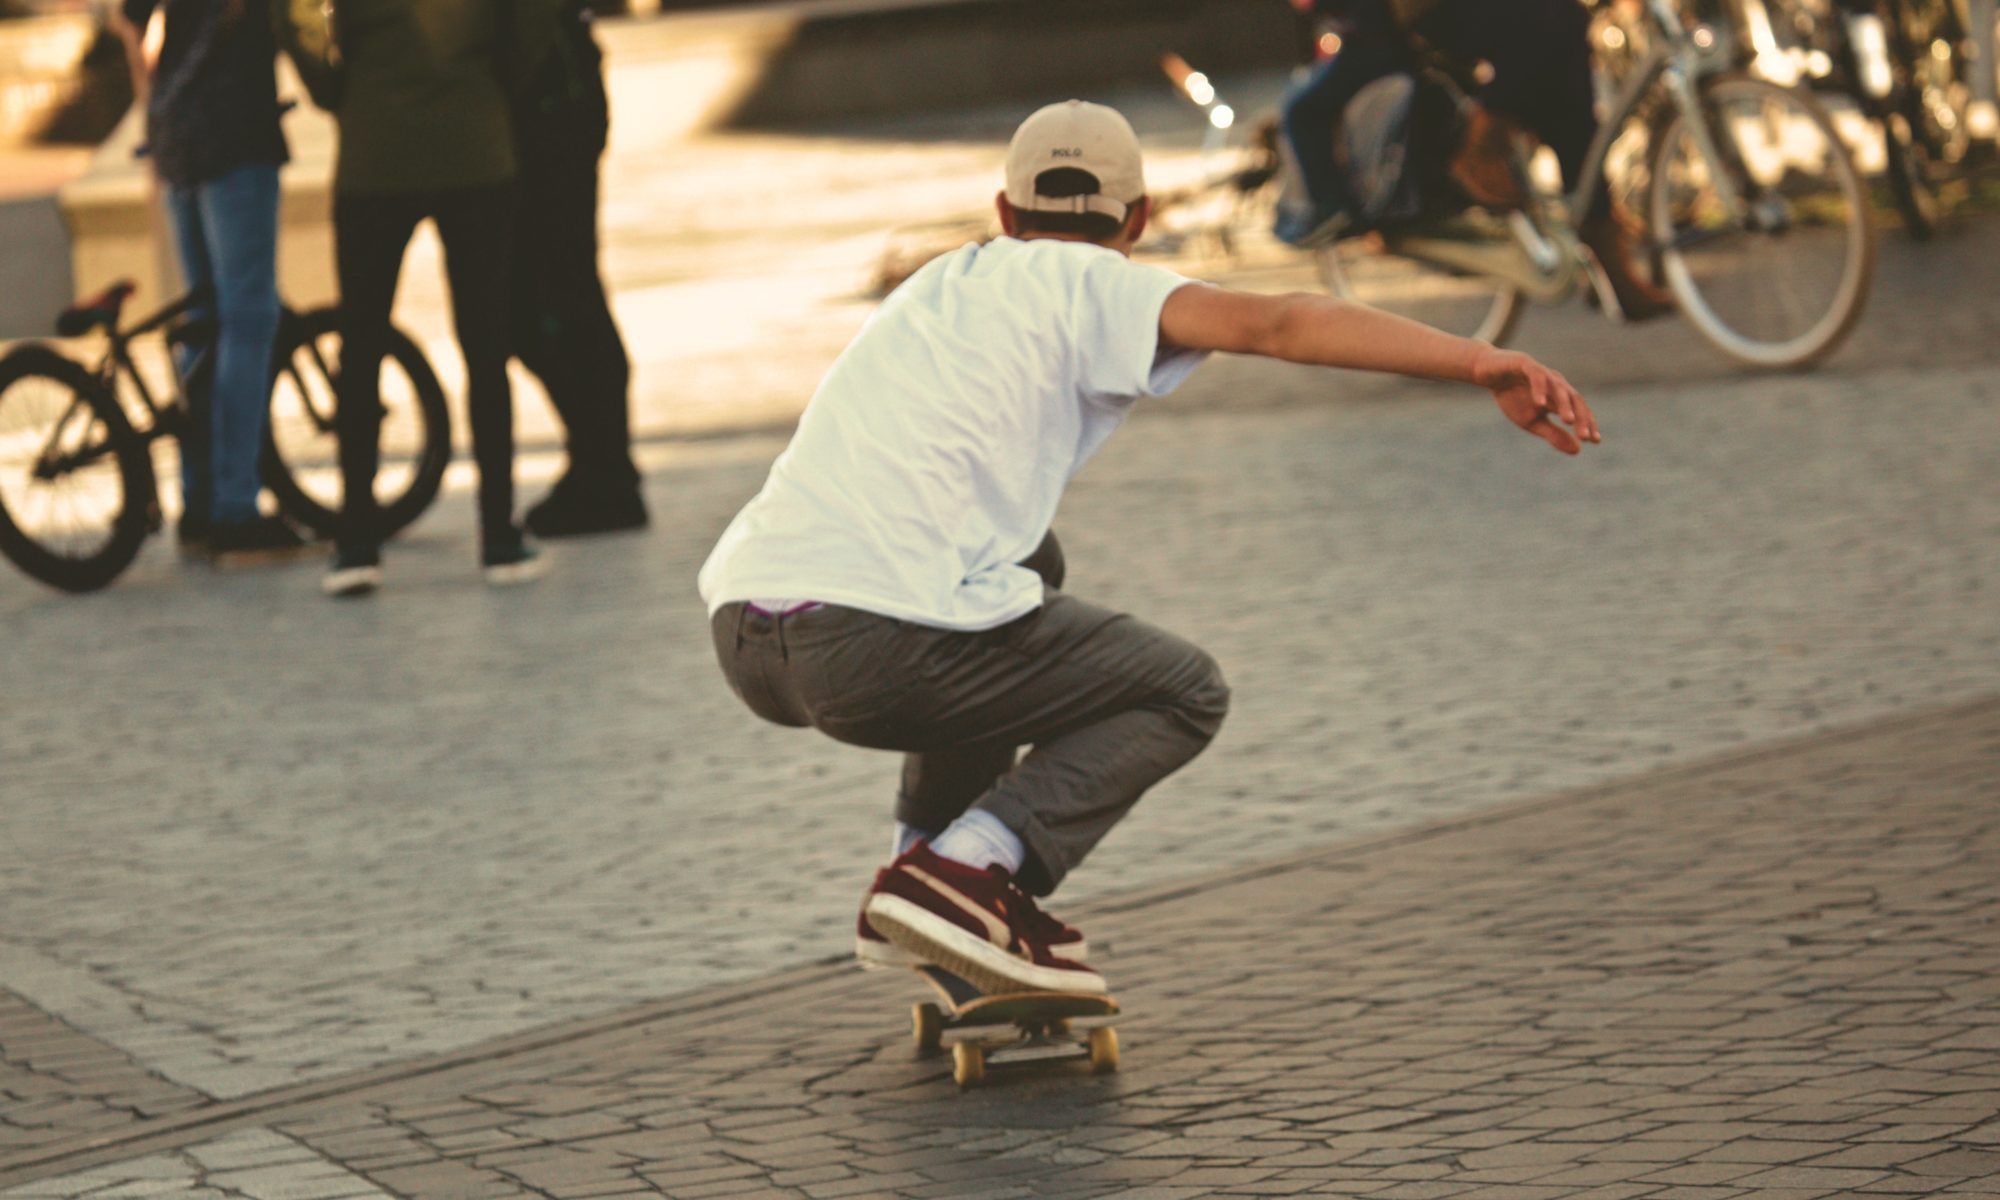 Skate1 Alveole632